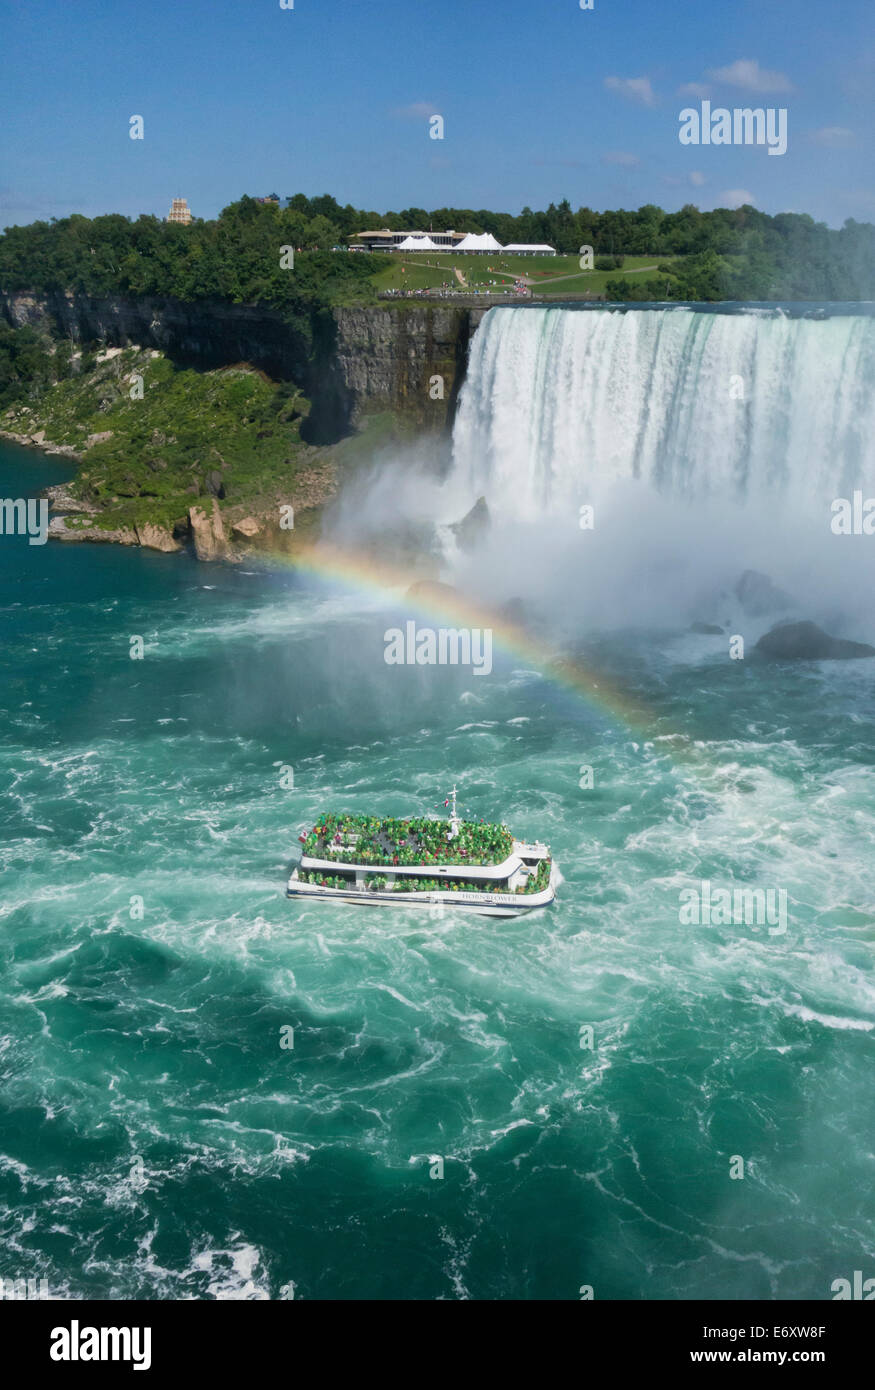 hornblower-niagara-falls-boat-tour-takes